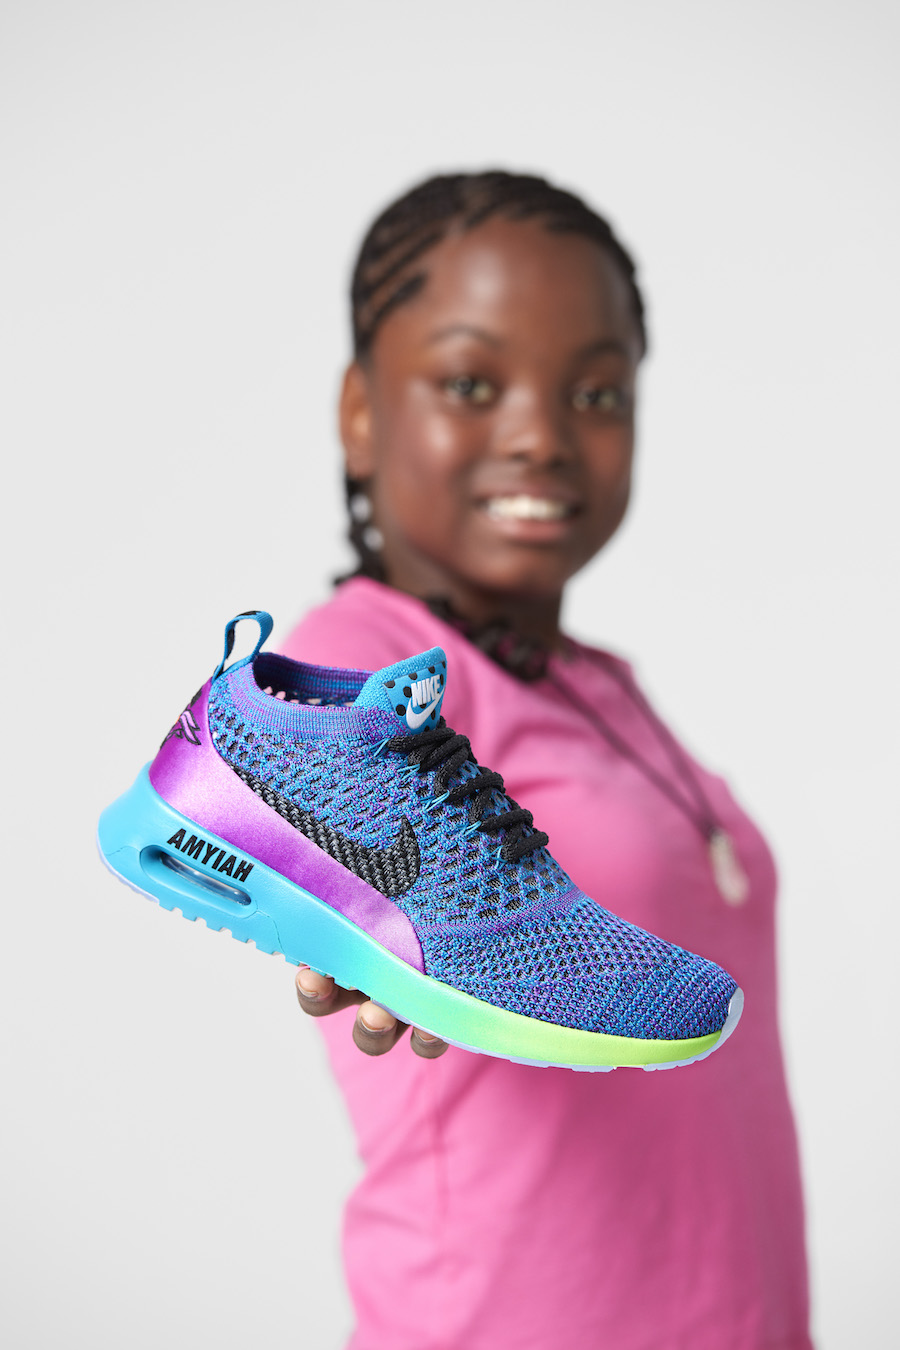 Amyiah Robinson Nike Air Max Thea Ultra Flyknit Doernbecher